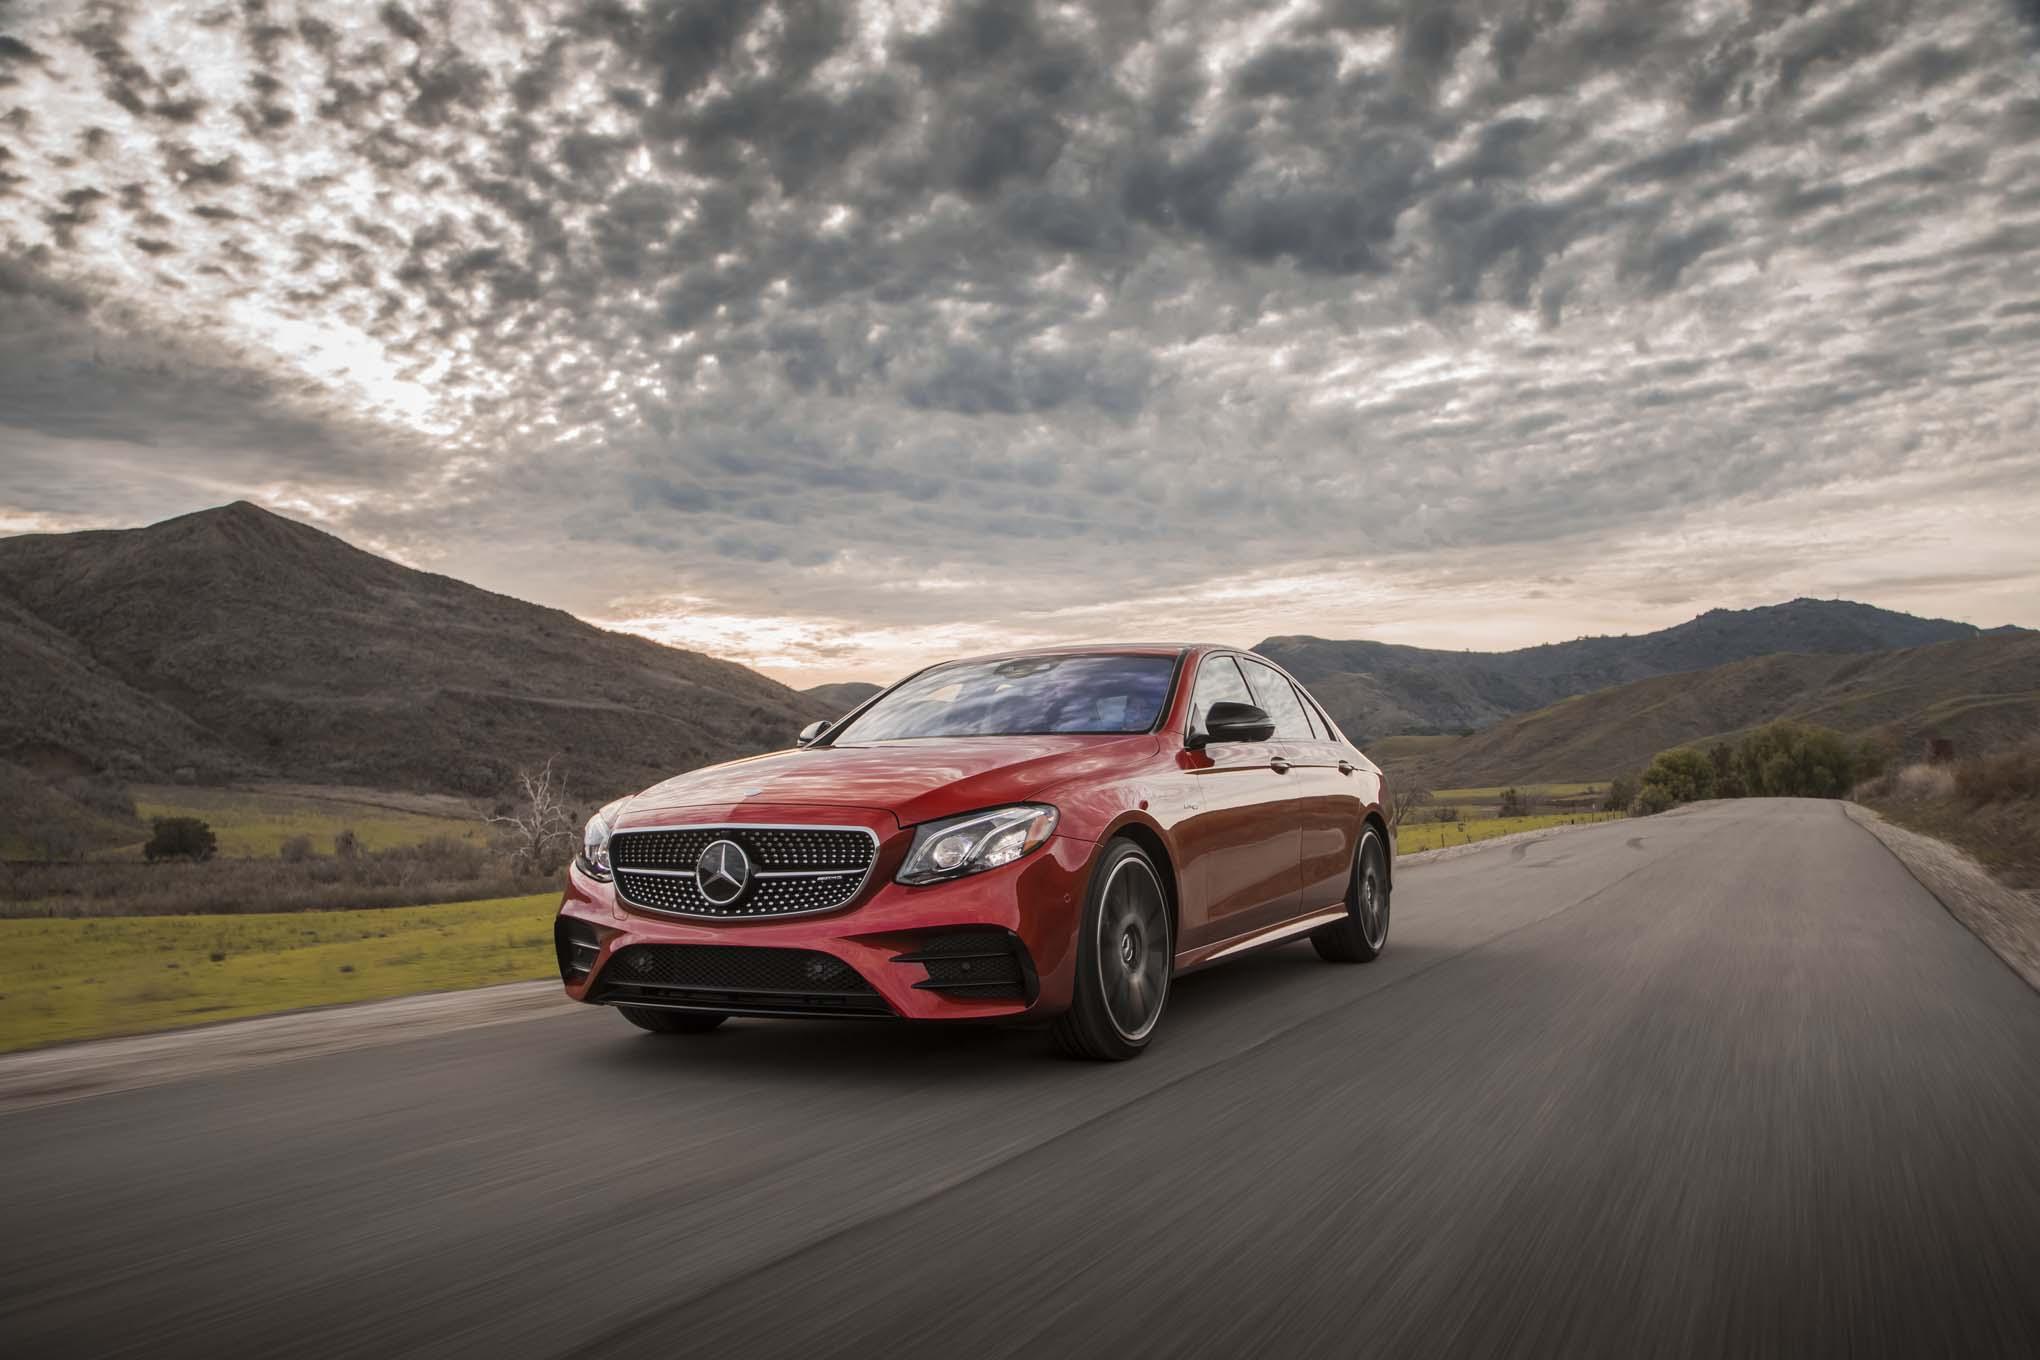 http://st.automobilemag.com/uploads/sites/11/2017/02/2017-Mercedes-AMG-E43-sedan-front-three-quarter-in-motion-12.jpg